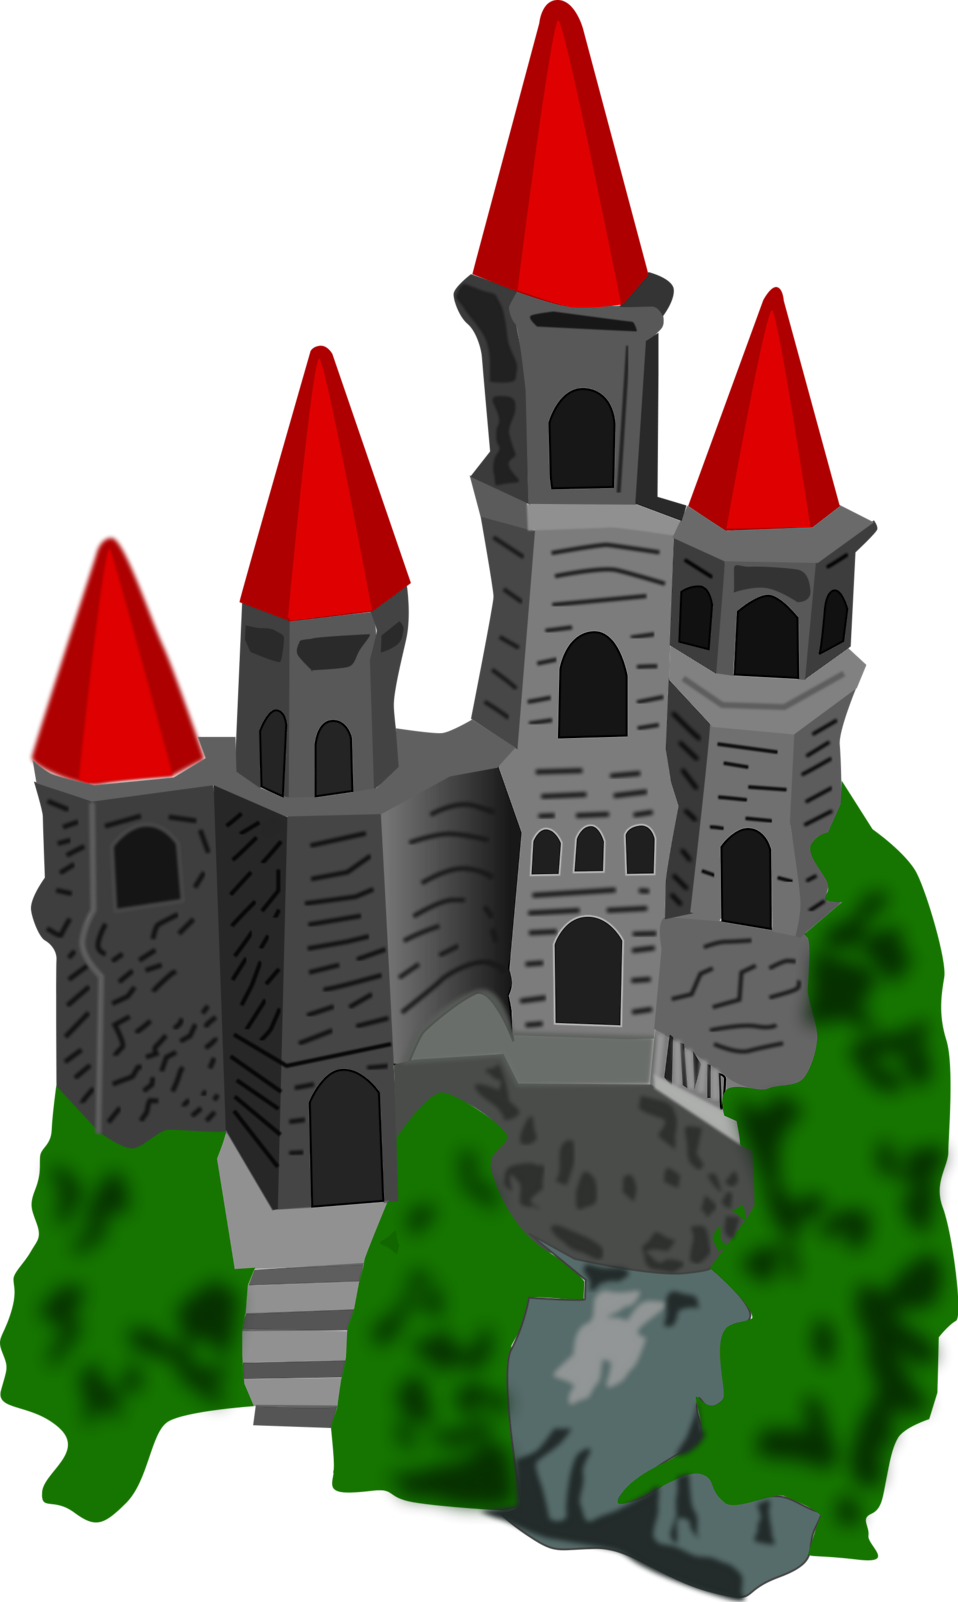 Clipart castle transparent background. Free stock photo illustration